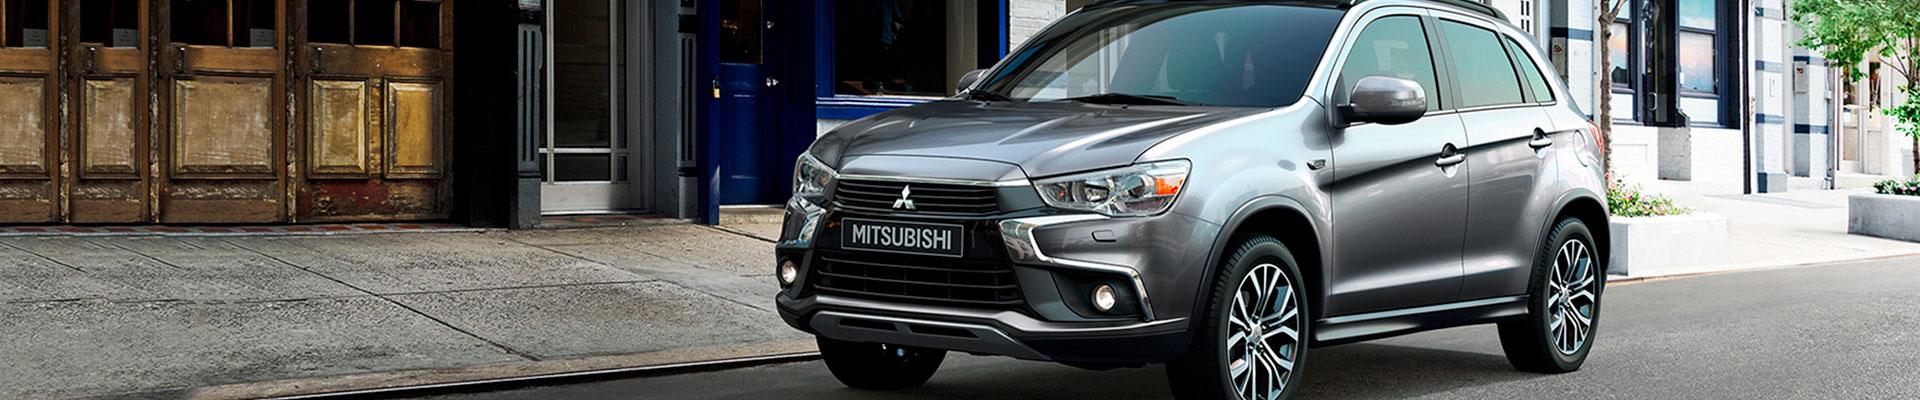 Aldikar Autoak, Concesionario Oficial Mitsubishi en Lasarte-Oria (Guipúzcoa)